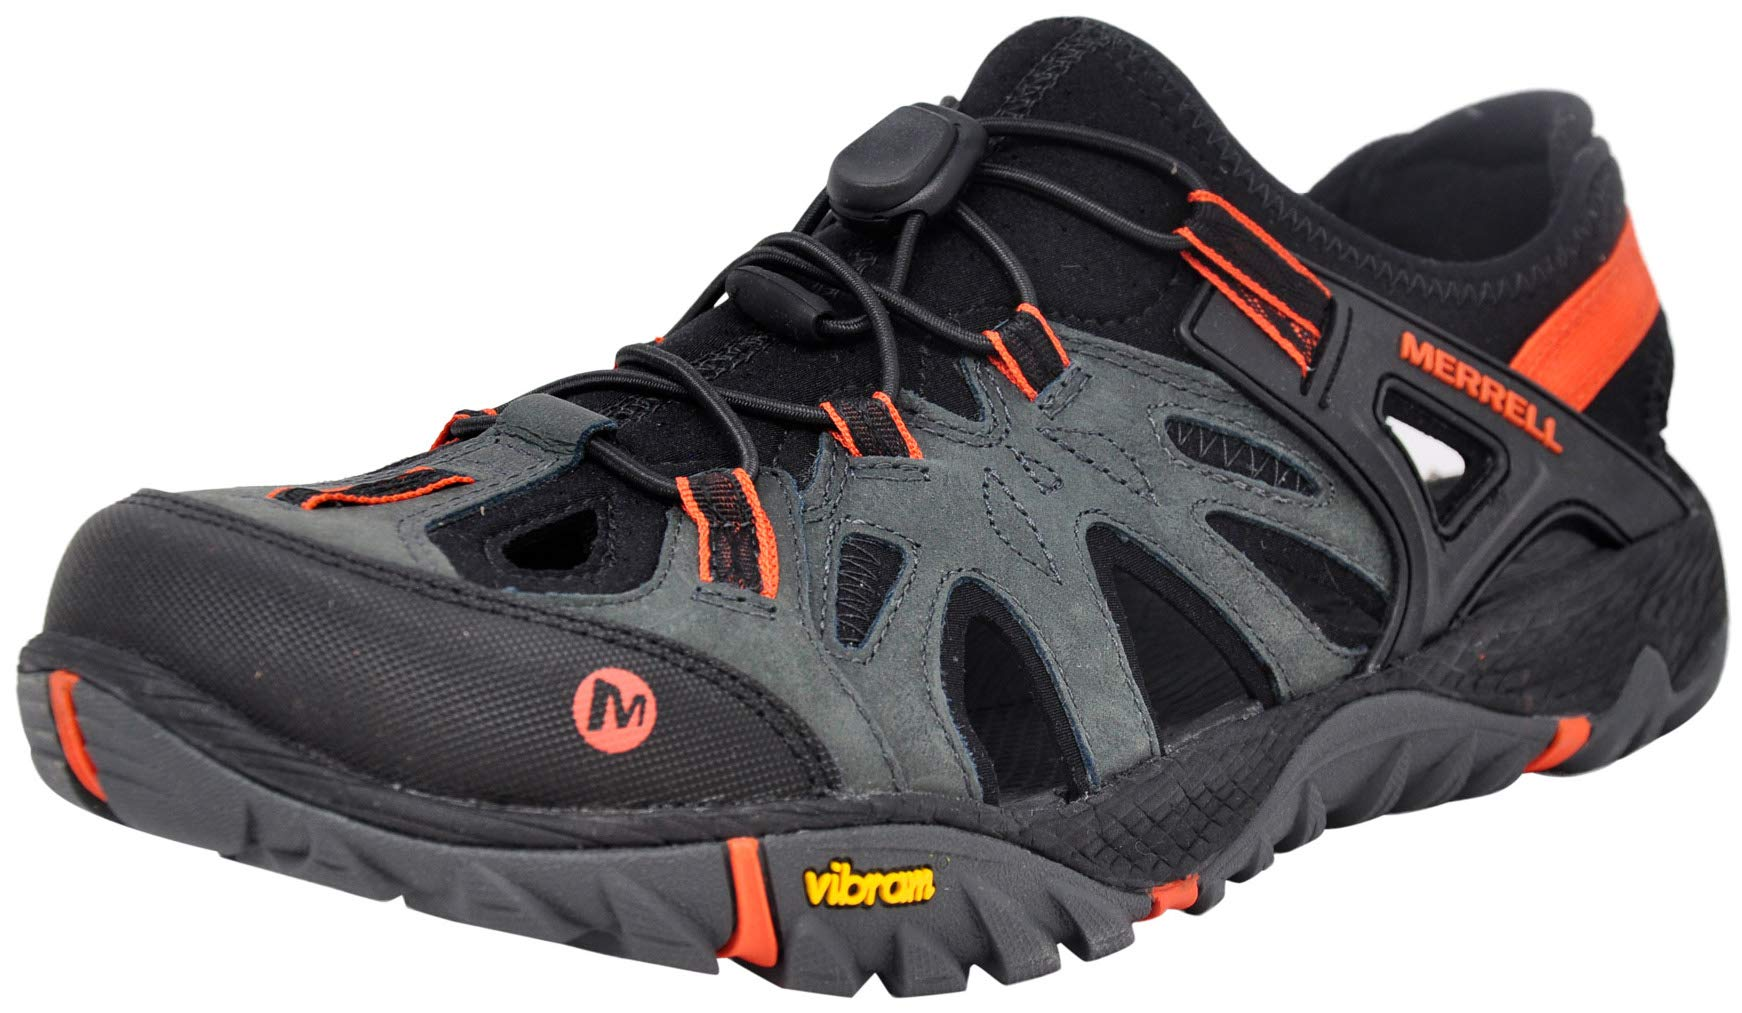 Merrell Men's All Out Blaze Sieve Water Shoes, Grey Dark Slate, 9.5 M US